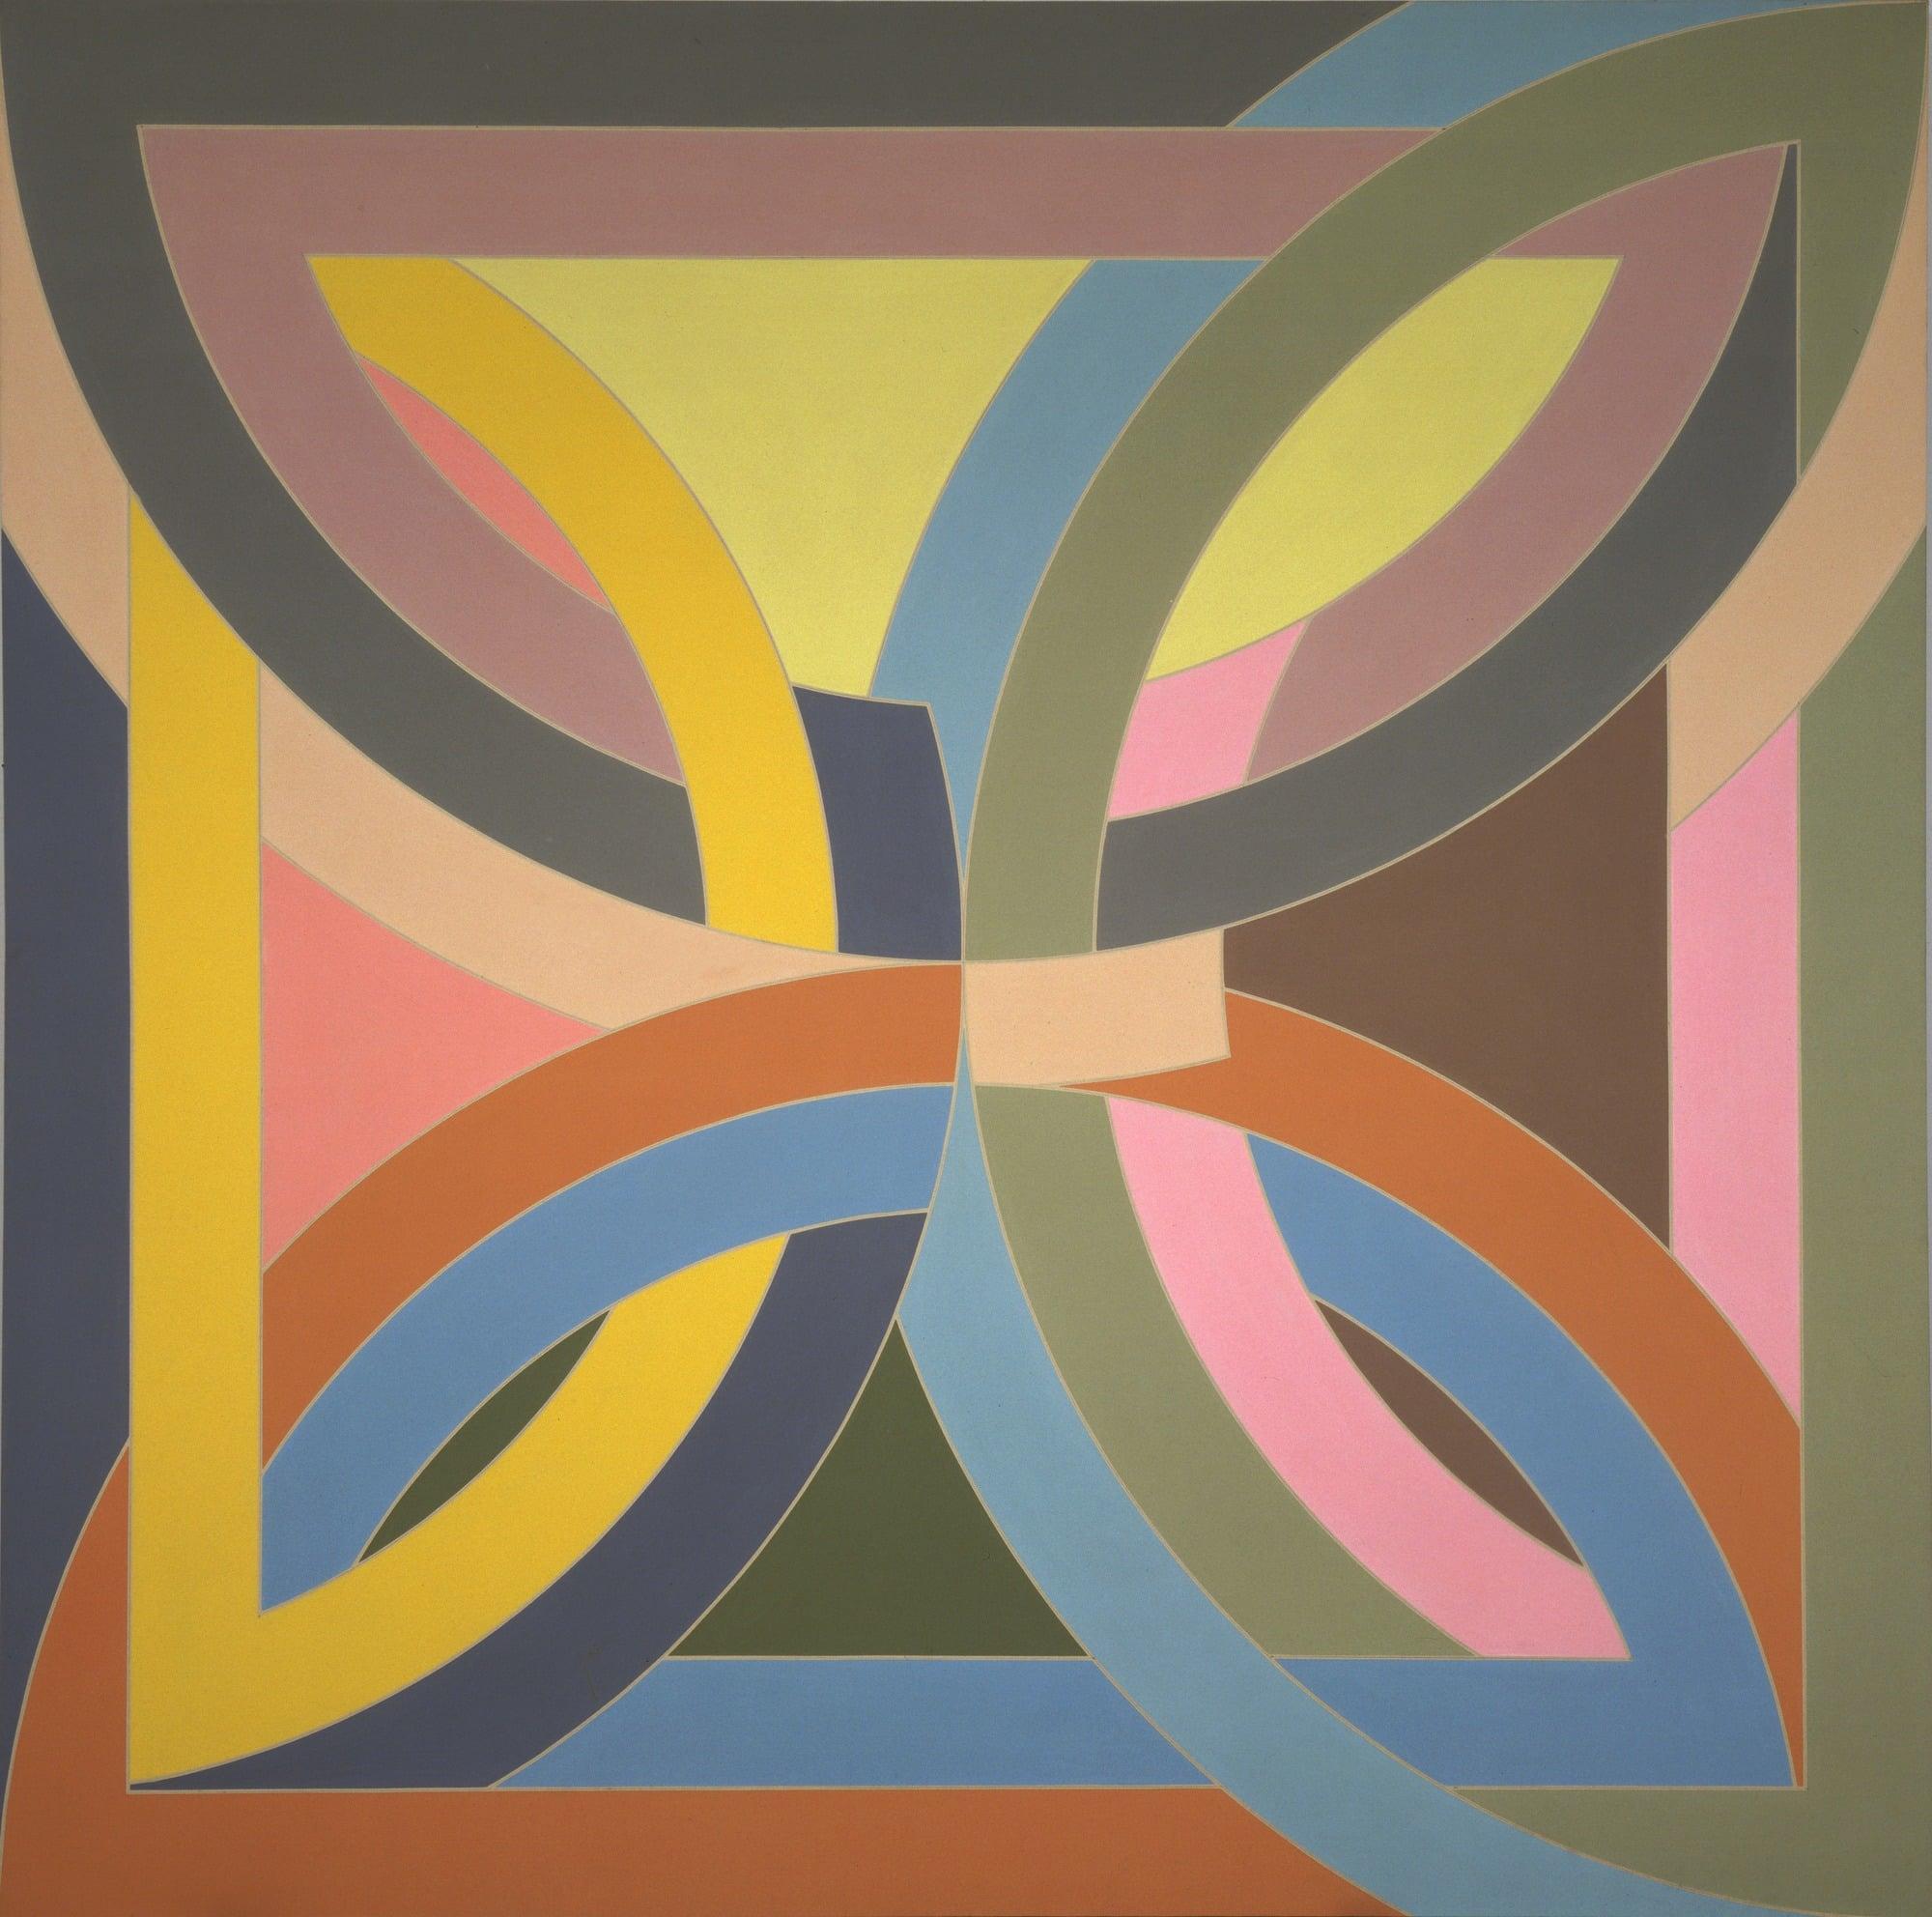 Frank Stella , Abra Variation I  1969